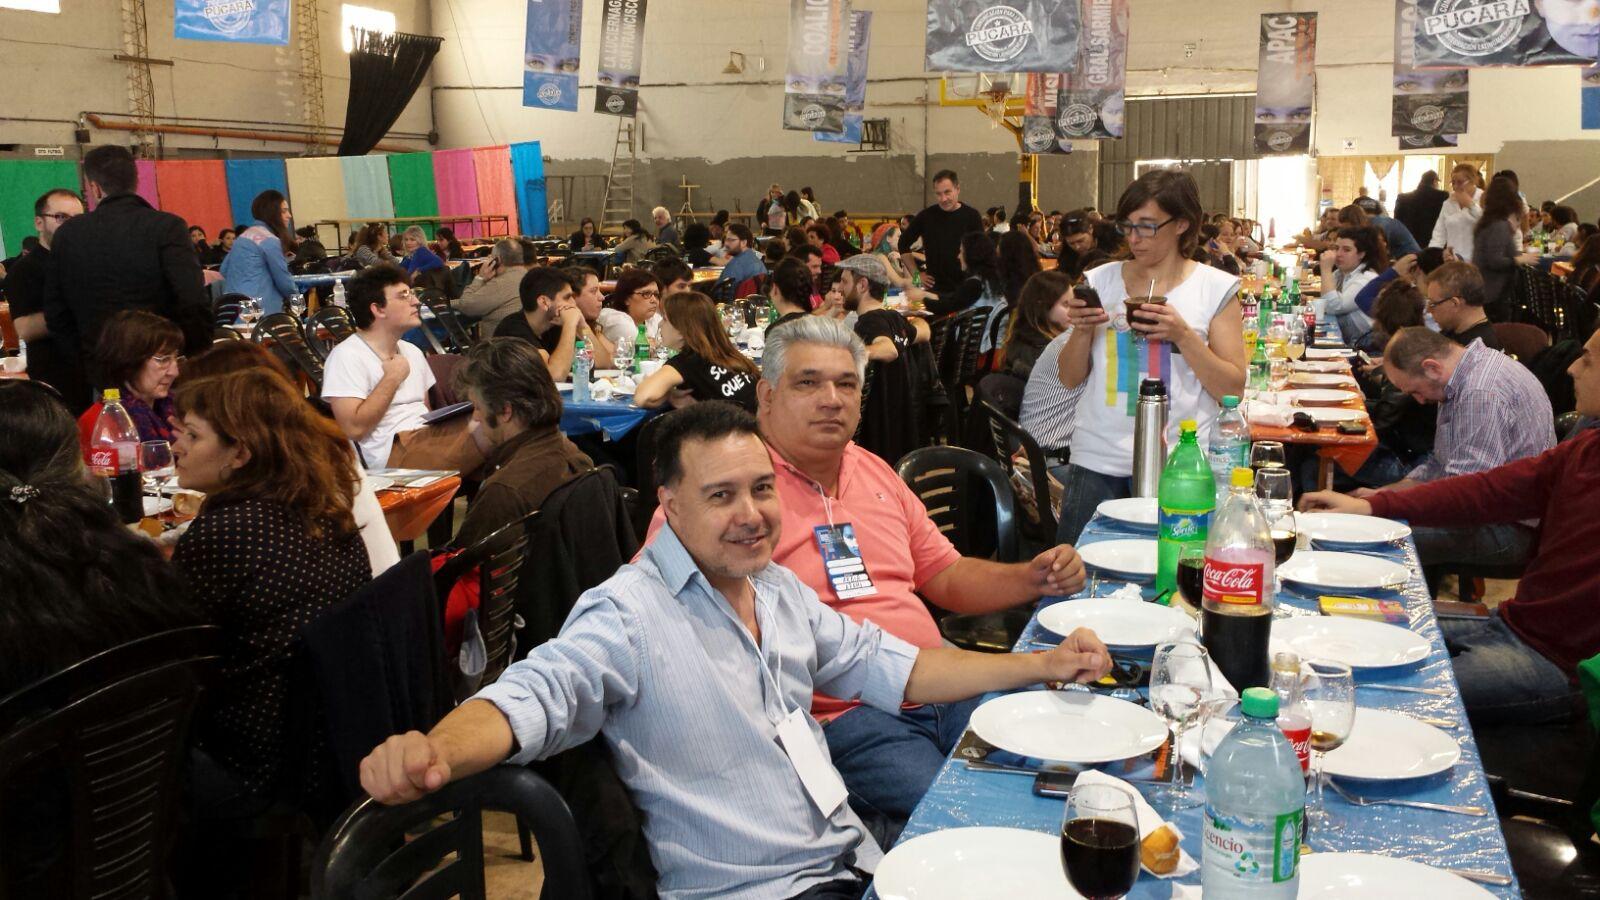 http://www.lacorameco.com.ar/imagenes/pucara.jpg